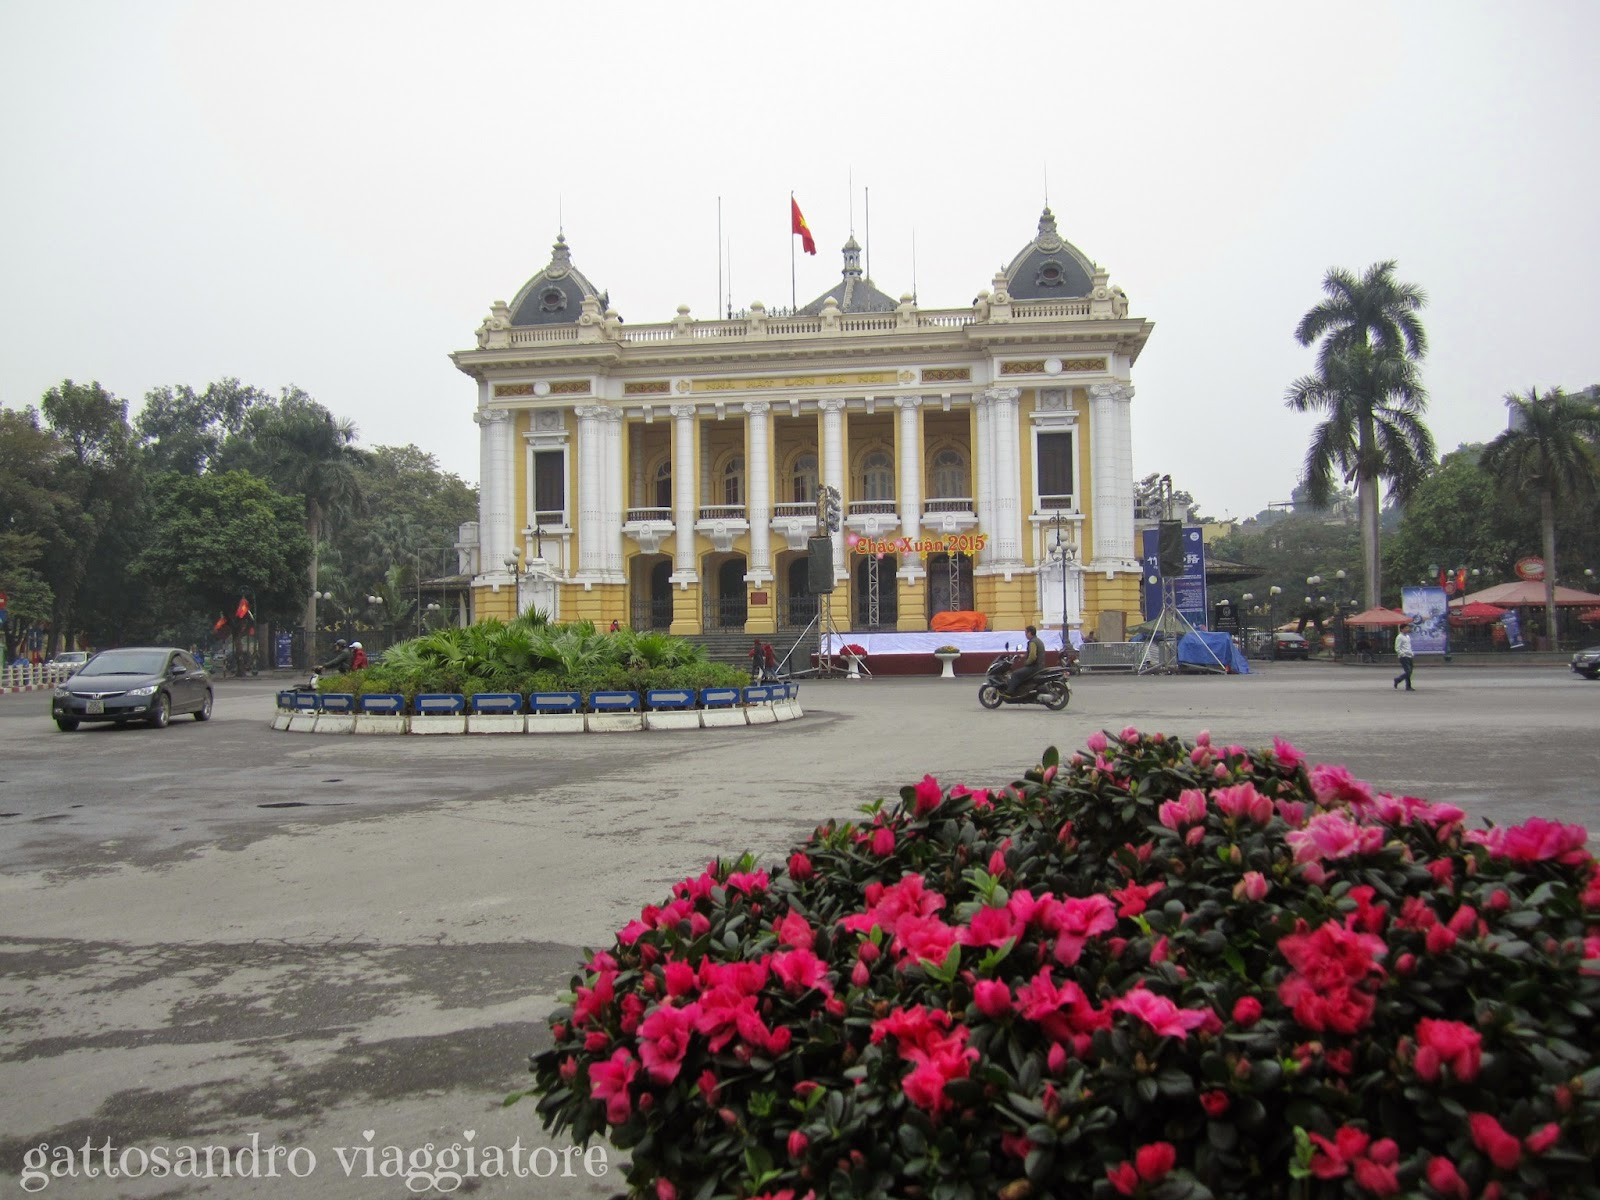 Hanoi Teatro de l'Opera